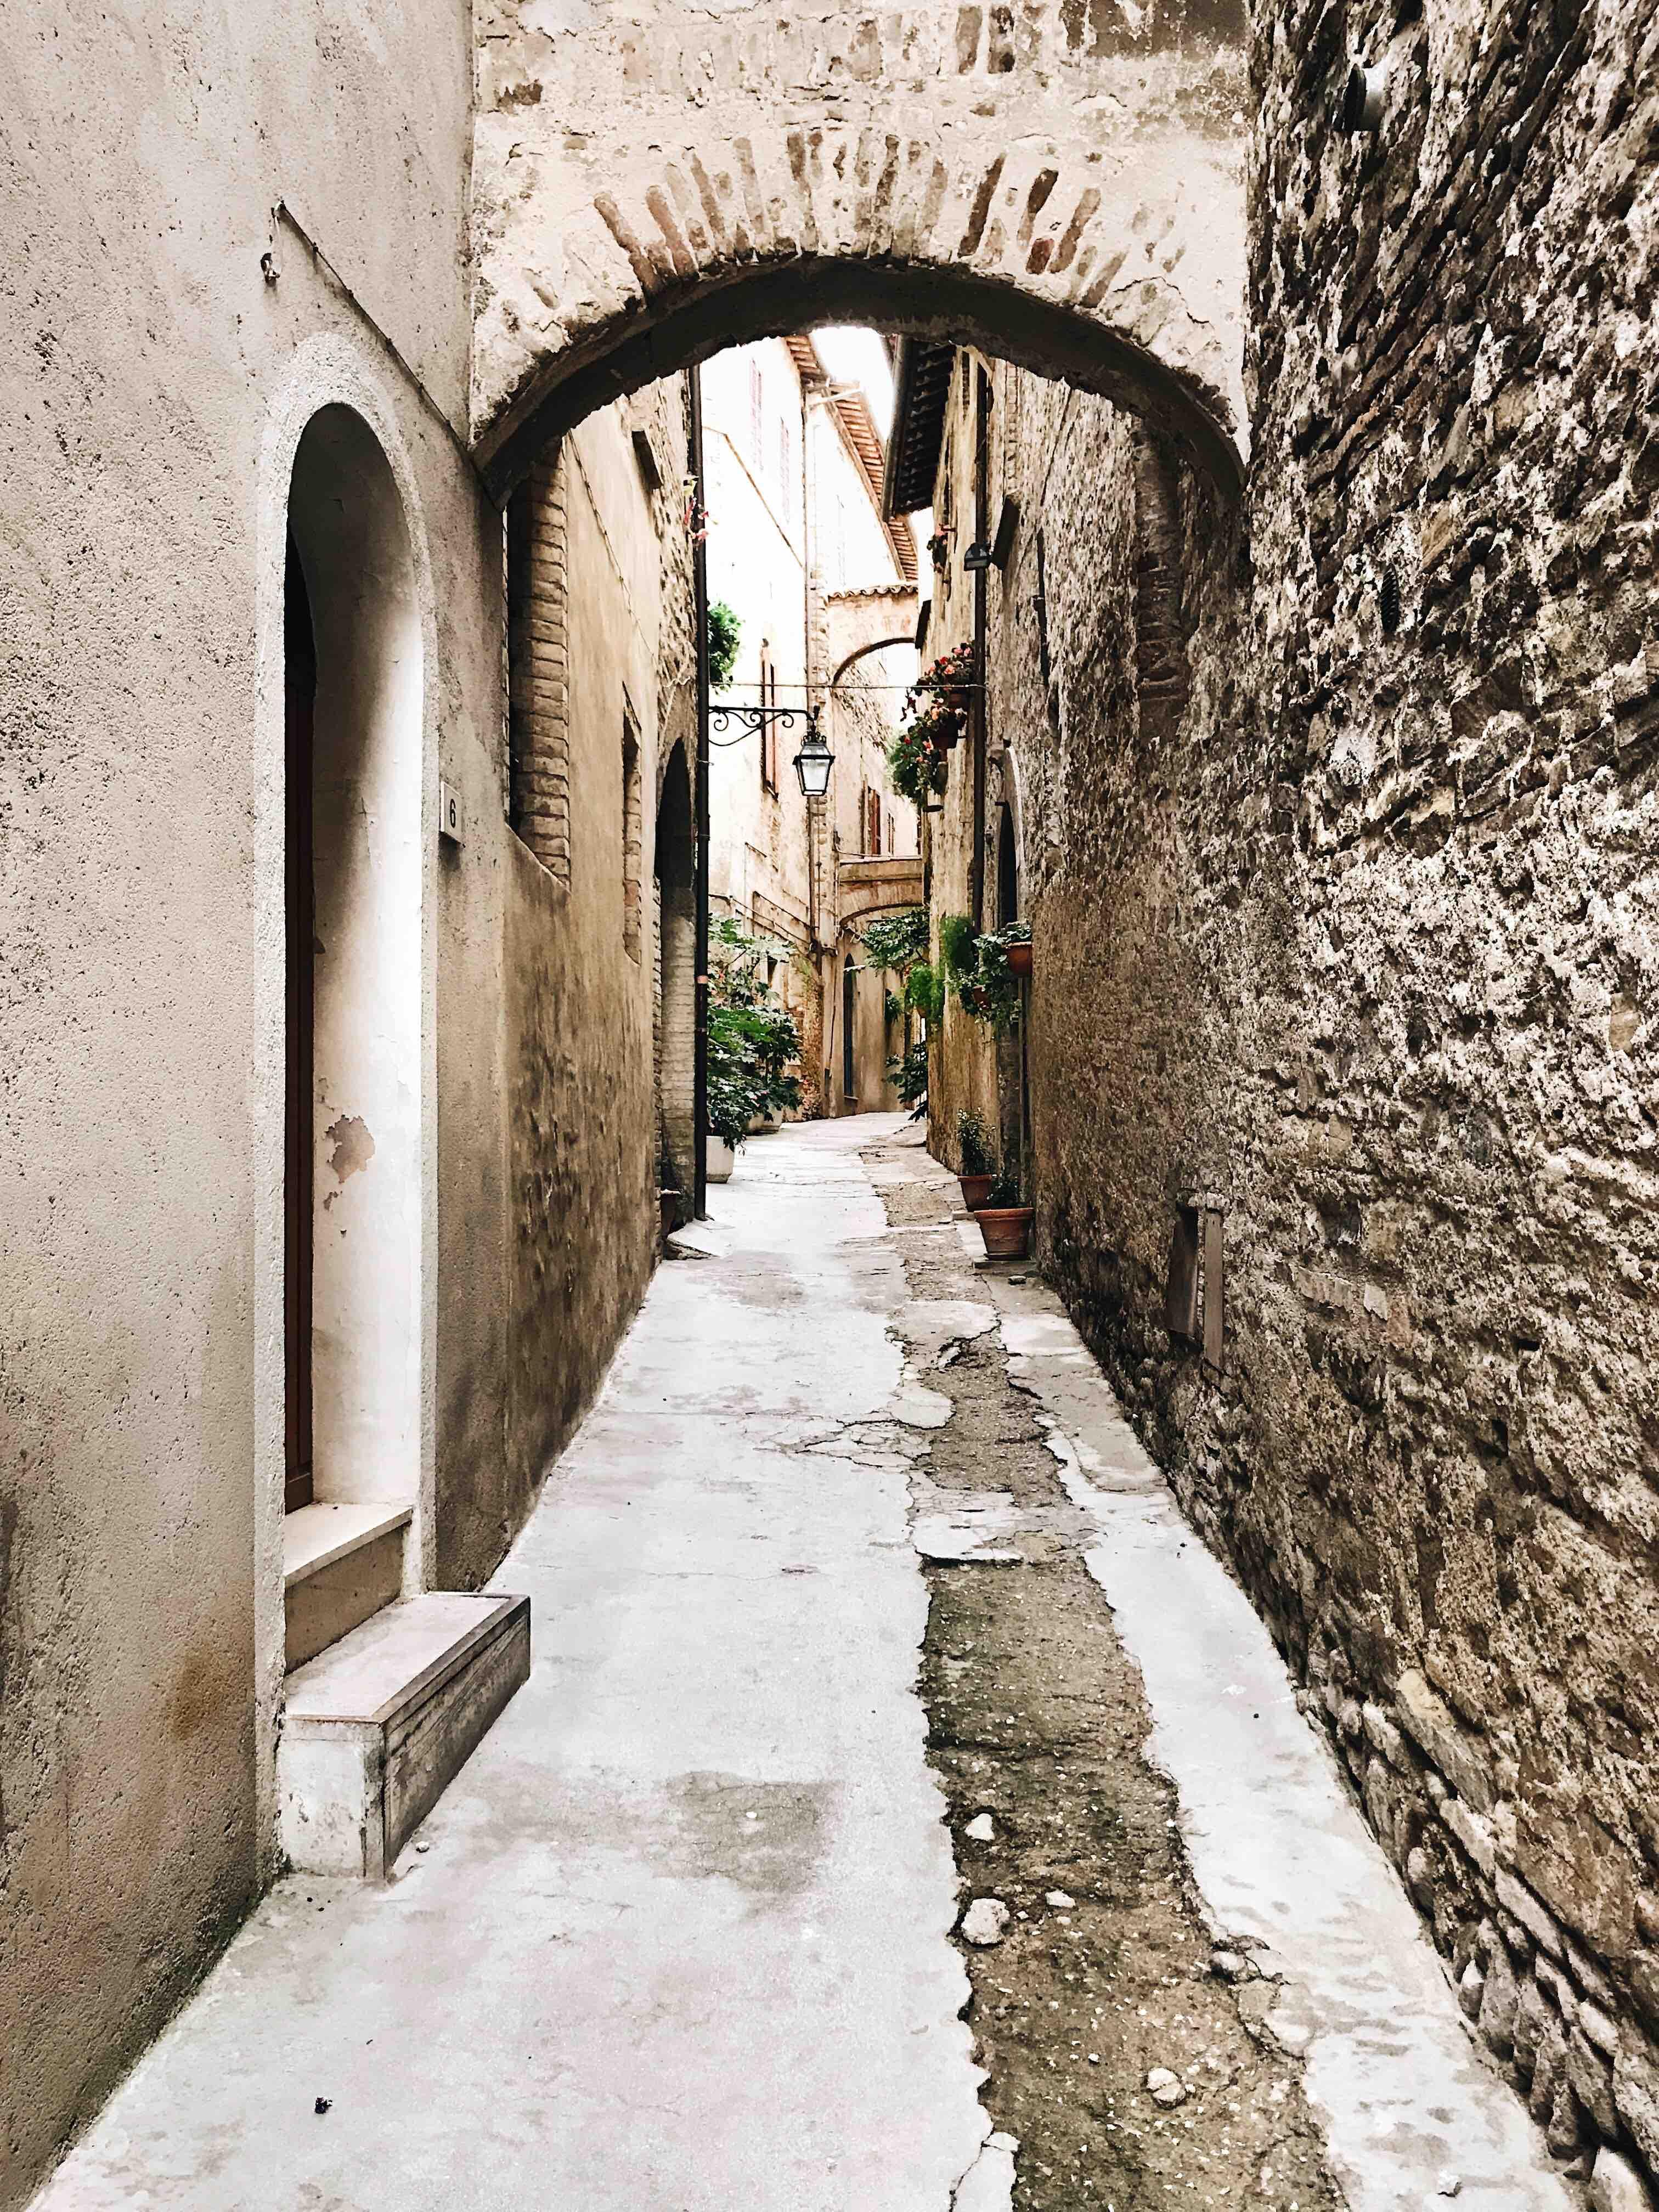 I borghi dell'Umbria: Bevagna